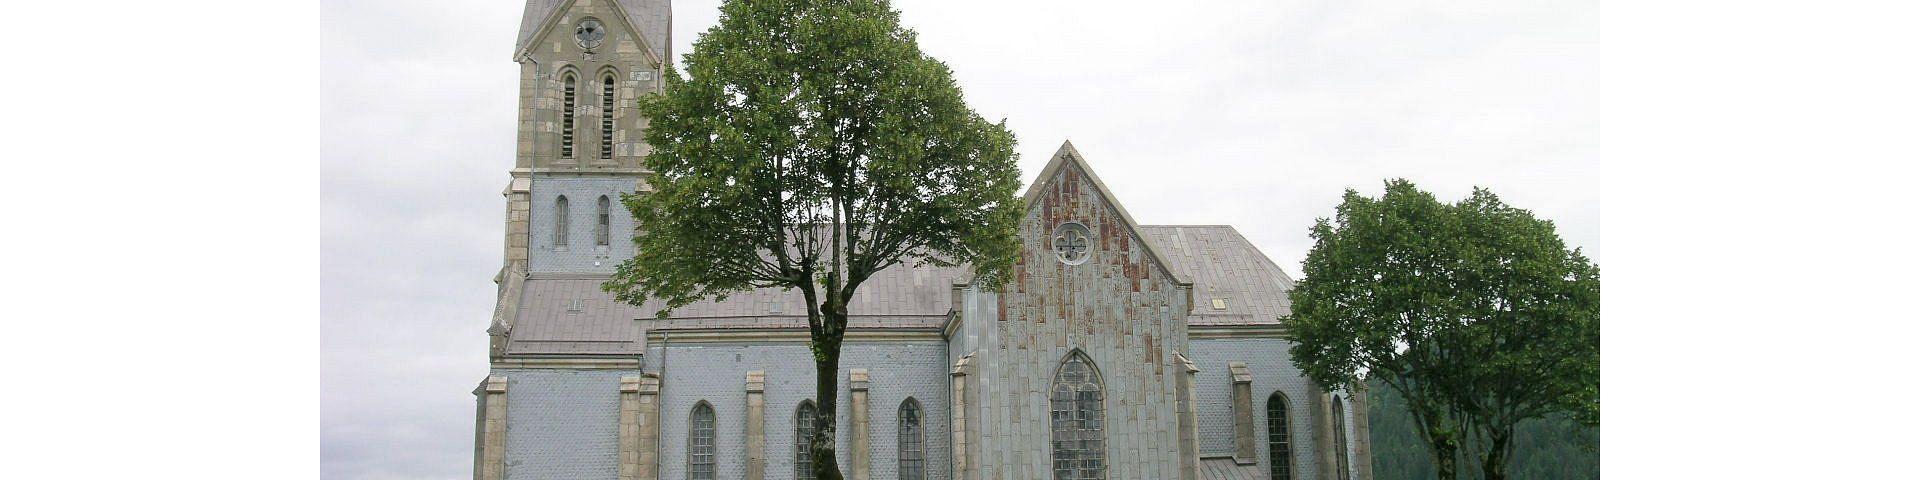 Choux-Eglise (39)